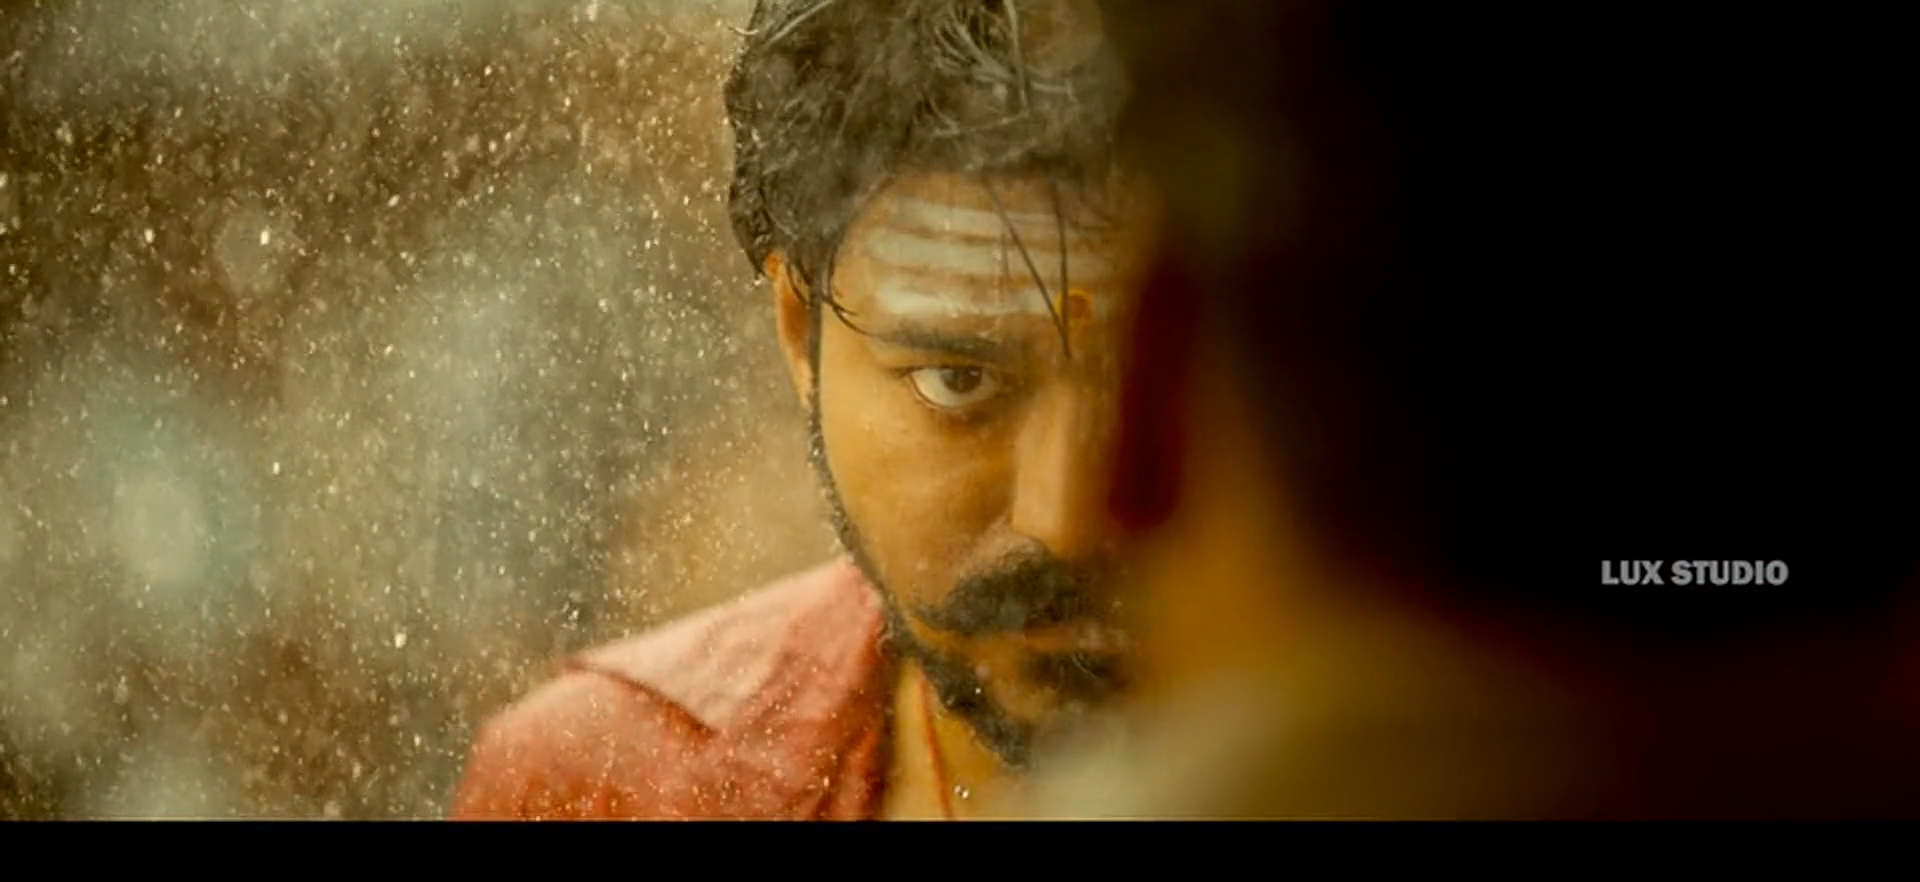 MERSAL (2017) 1080p - HDRip - x264 - DD5.1 [Dual Audio][Telugu+Tamil] DrC Exclusive